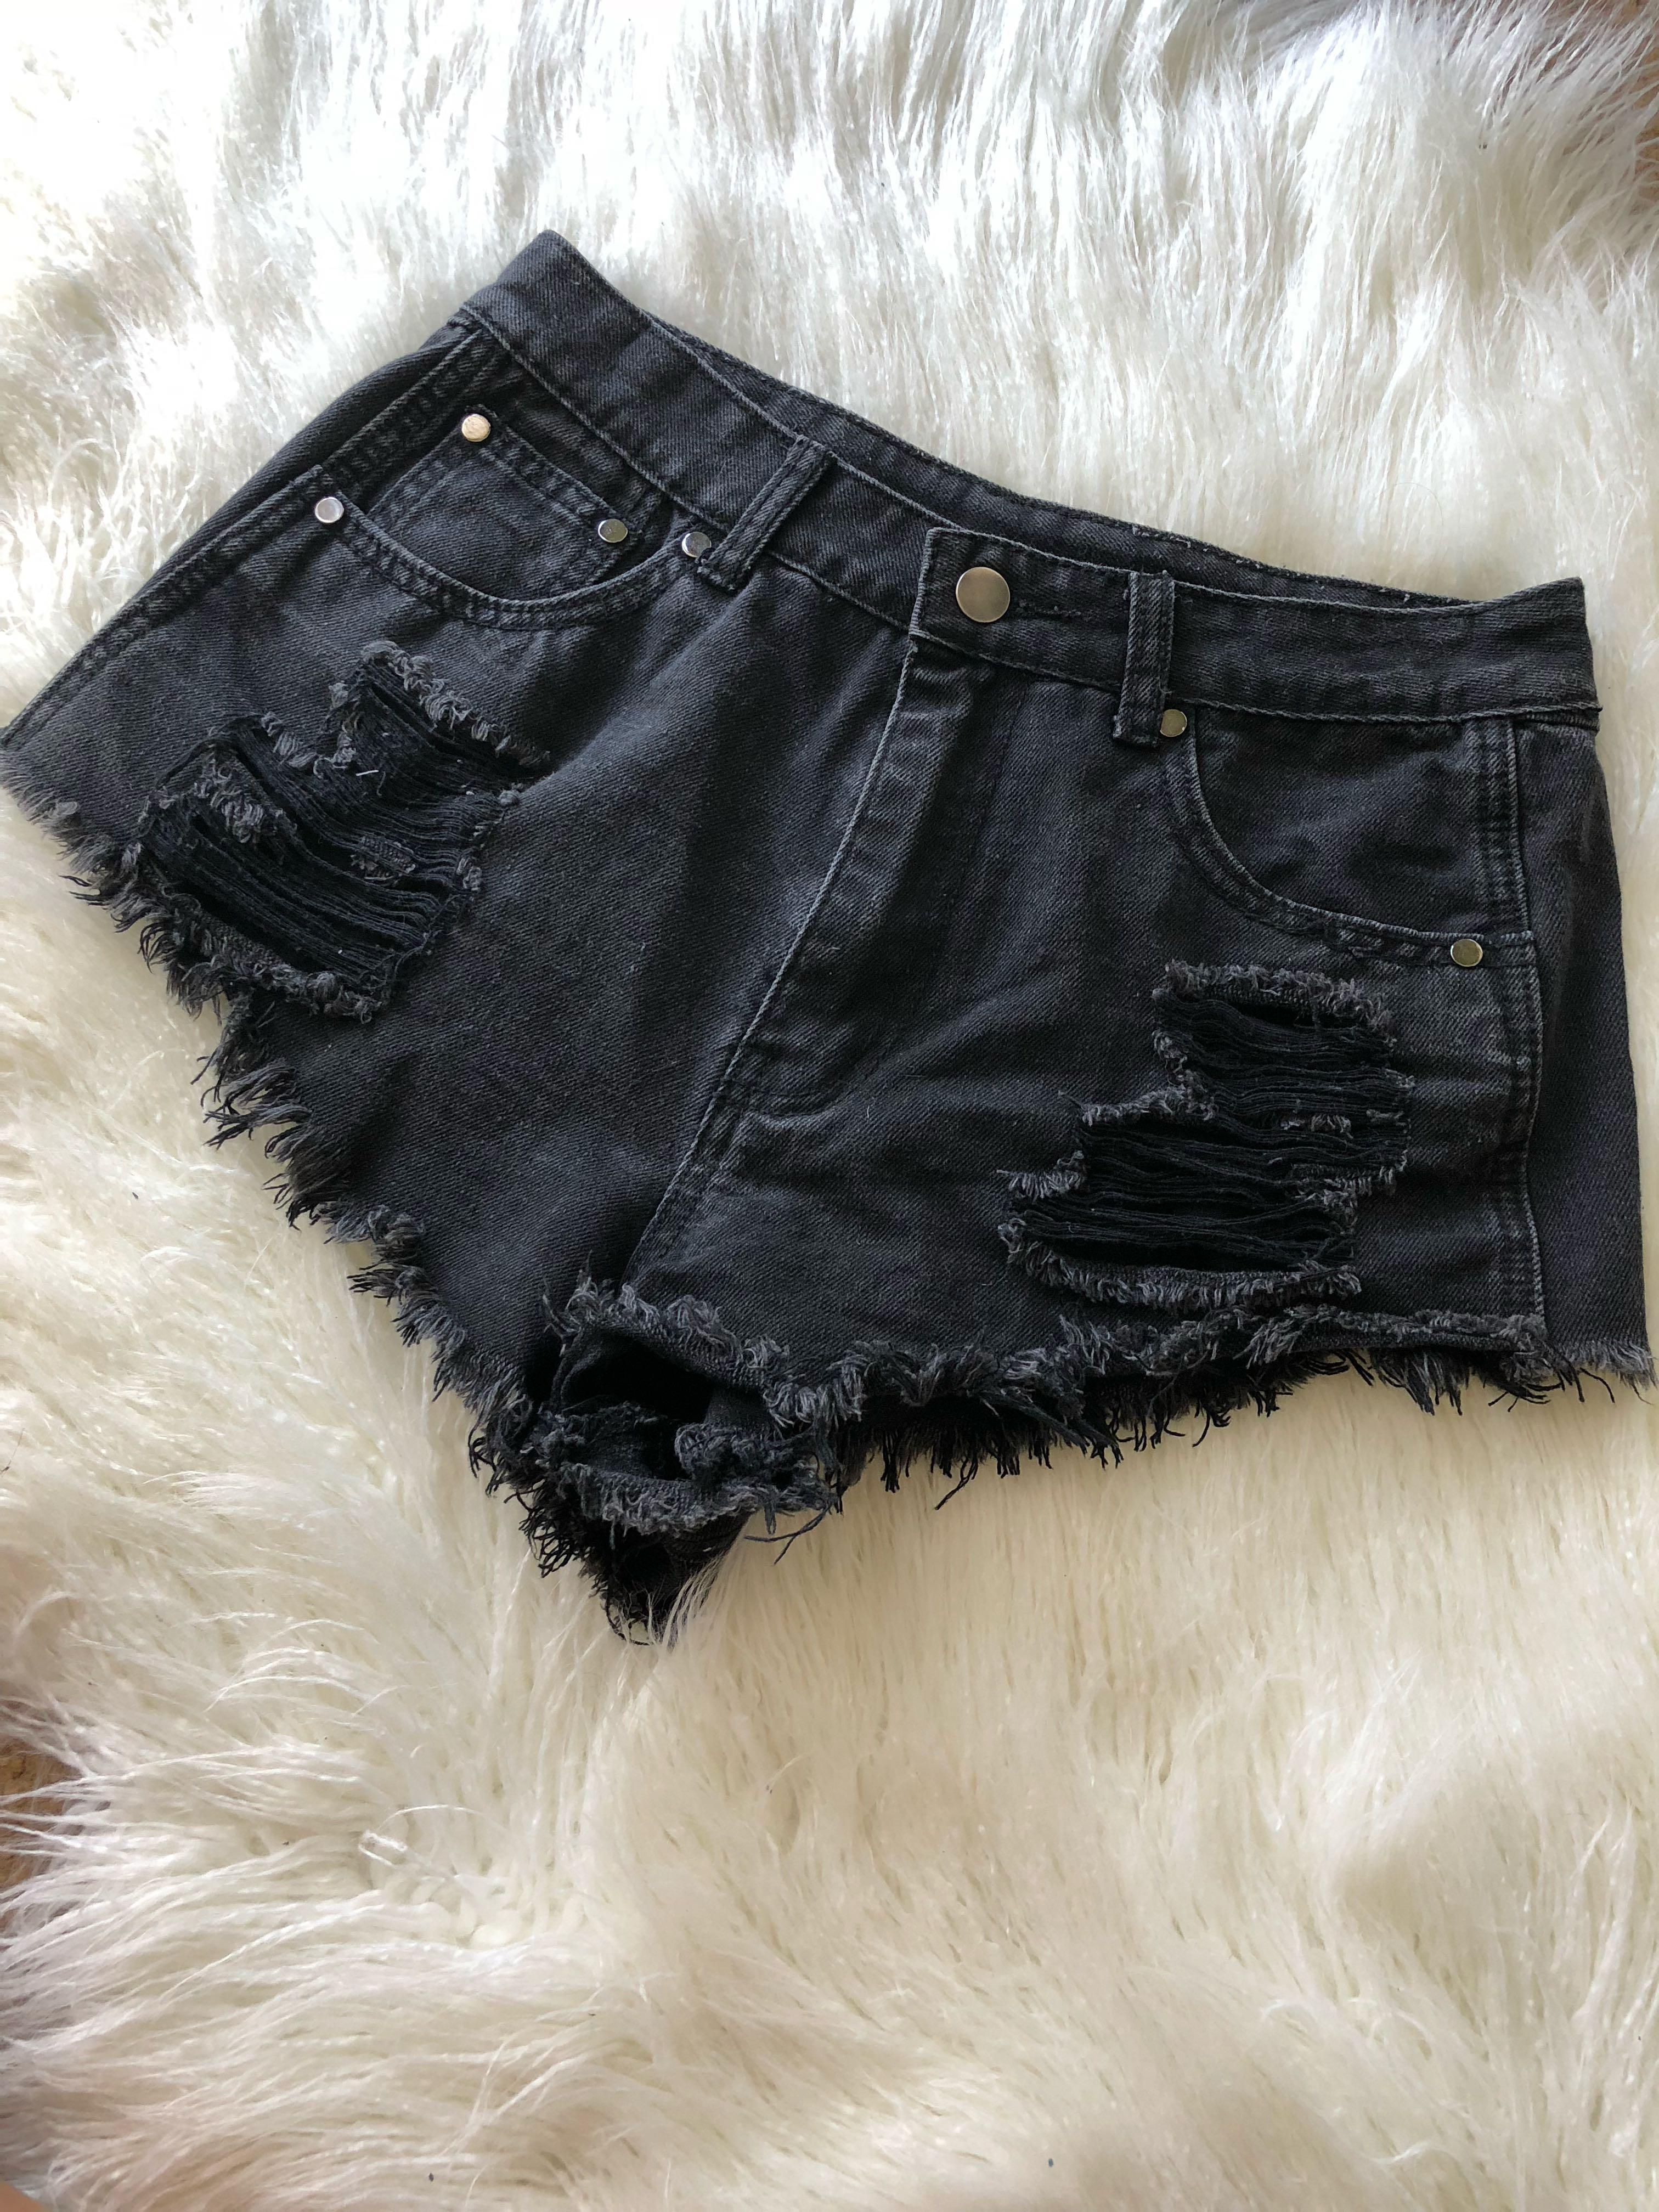 💕 Neon Heart - Black Shorts